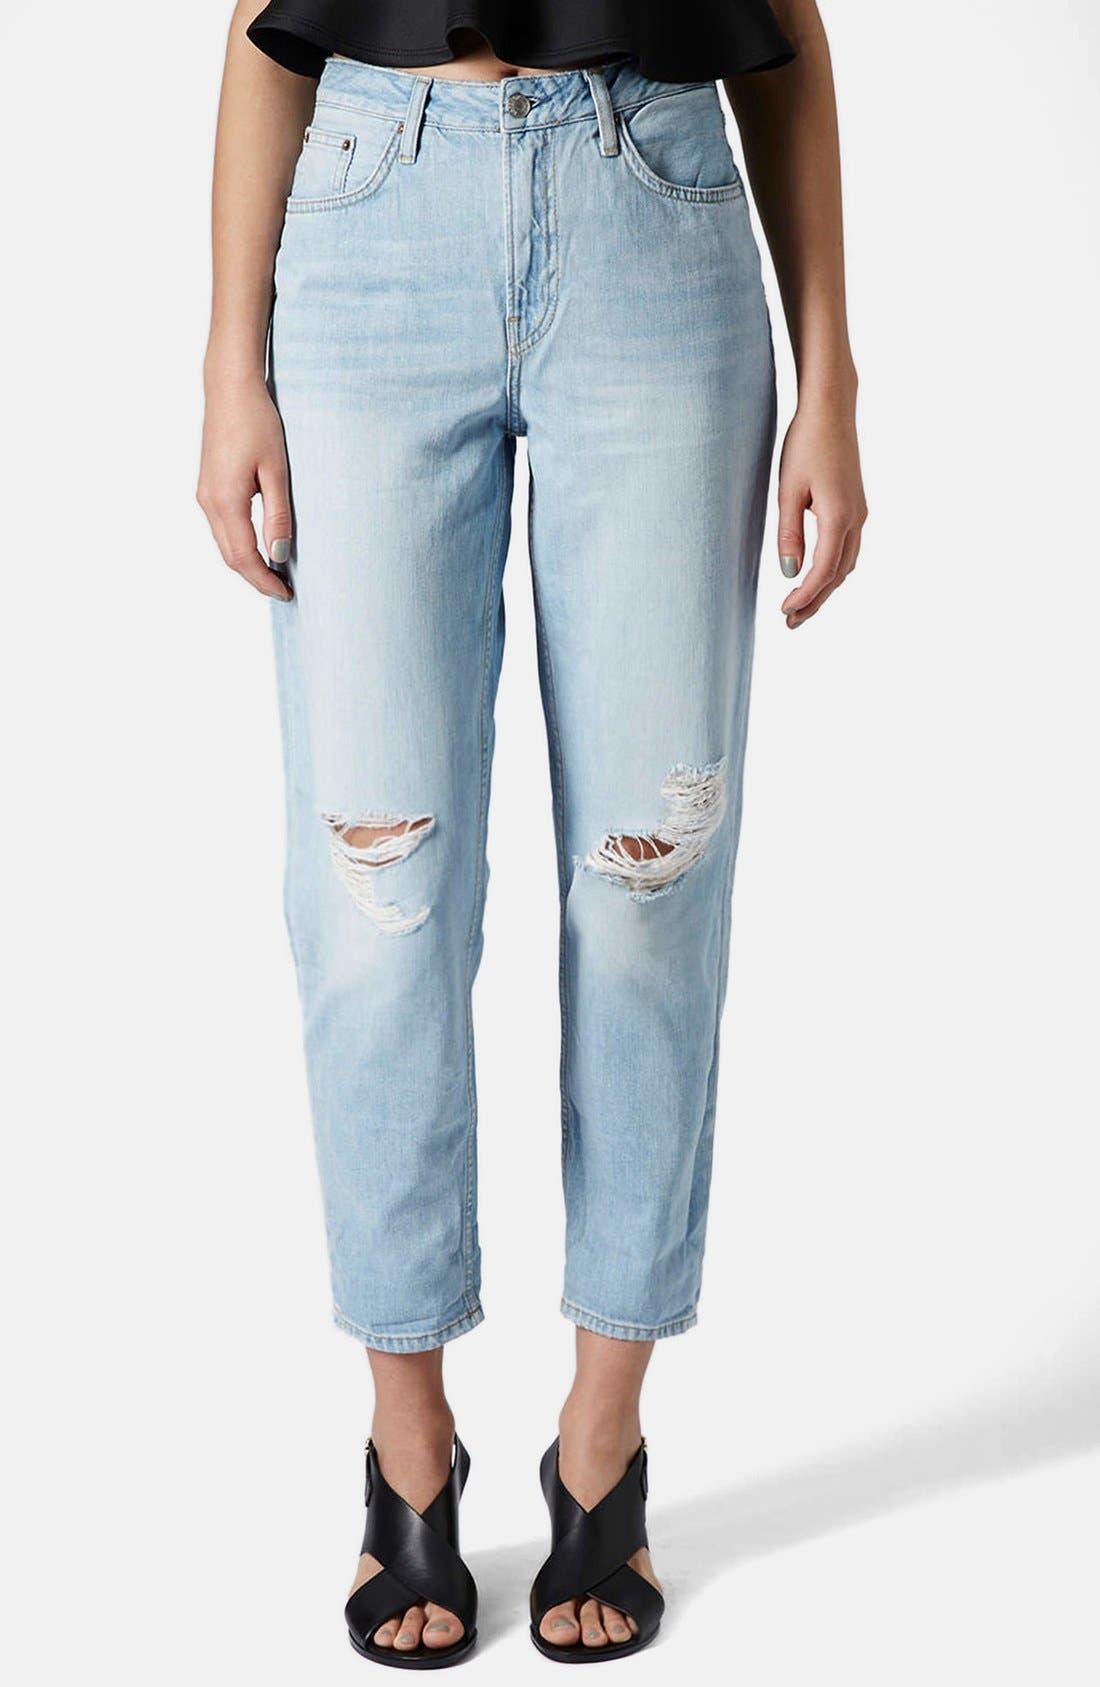 Alternate Image 1 Selected - Topshop Moto 'Hayden' Ripped Boyfriend Jeans (Bleach Stone)